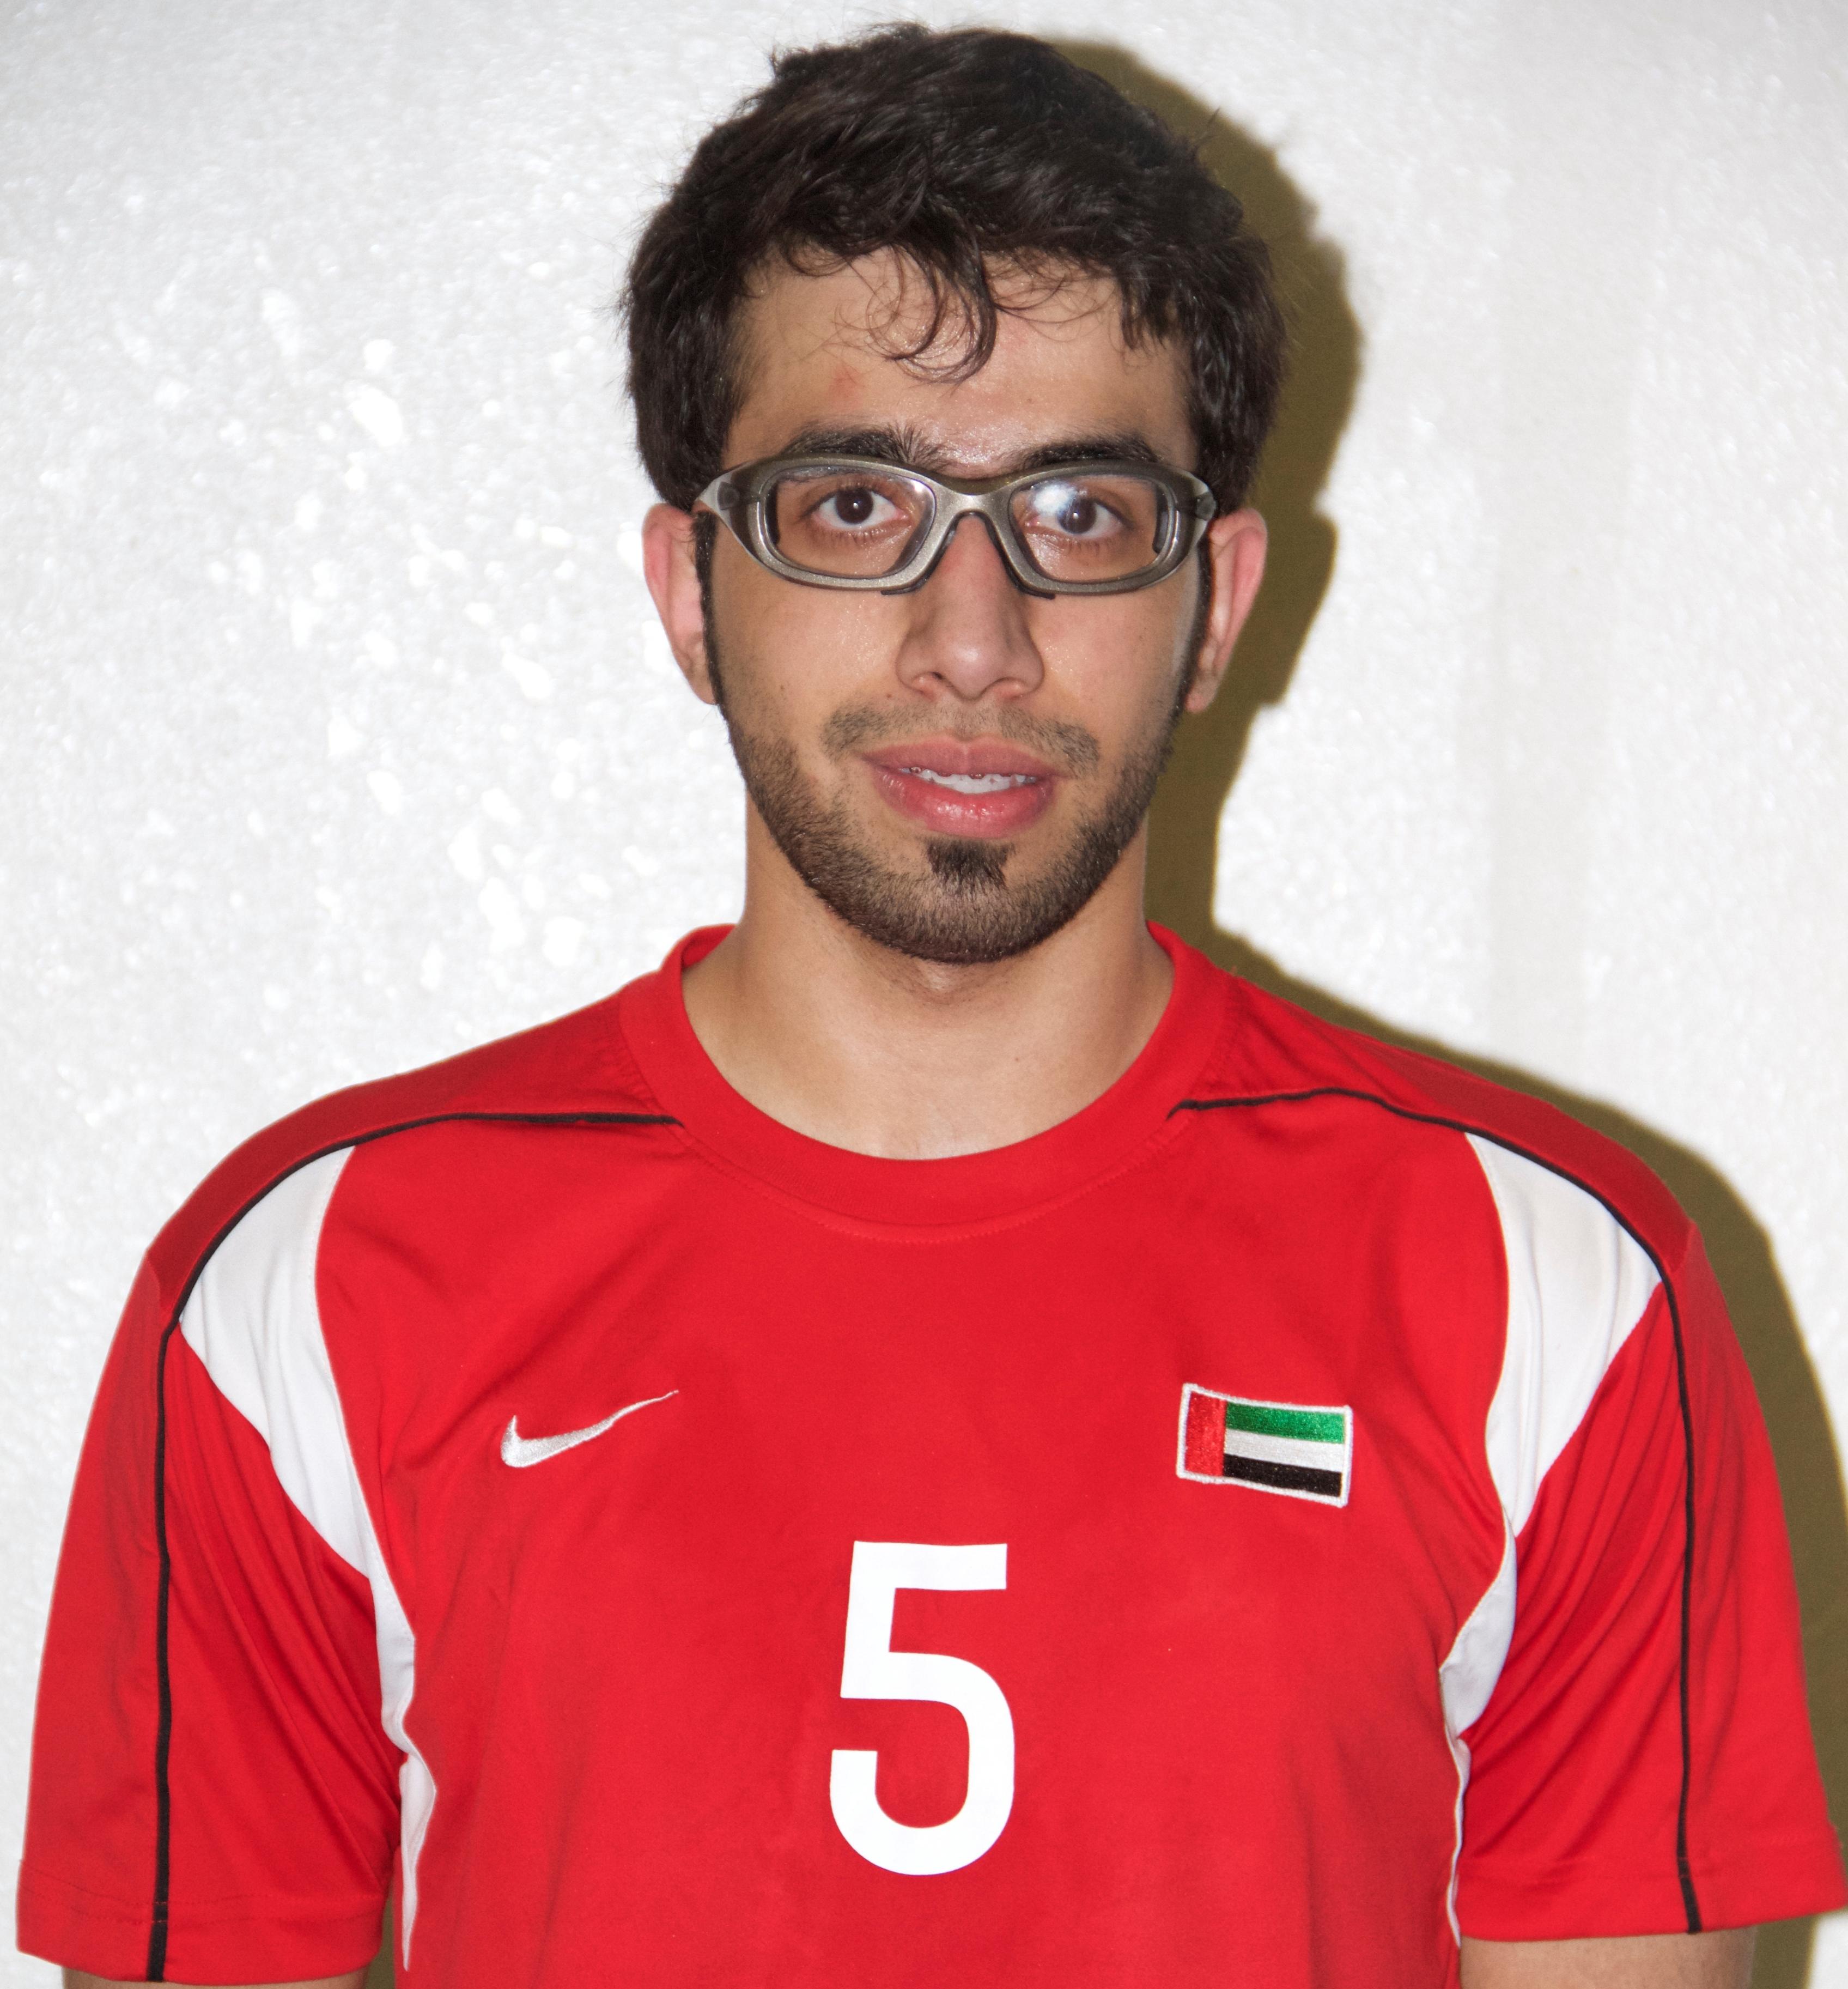 Adel Alblooshi